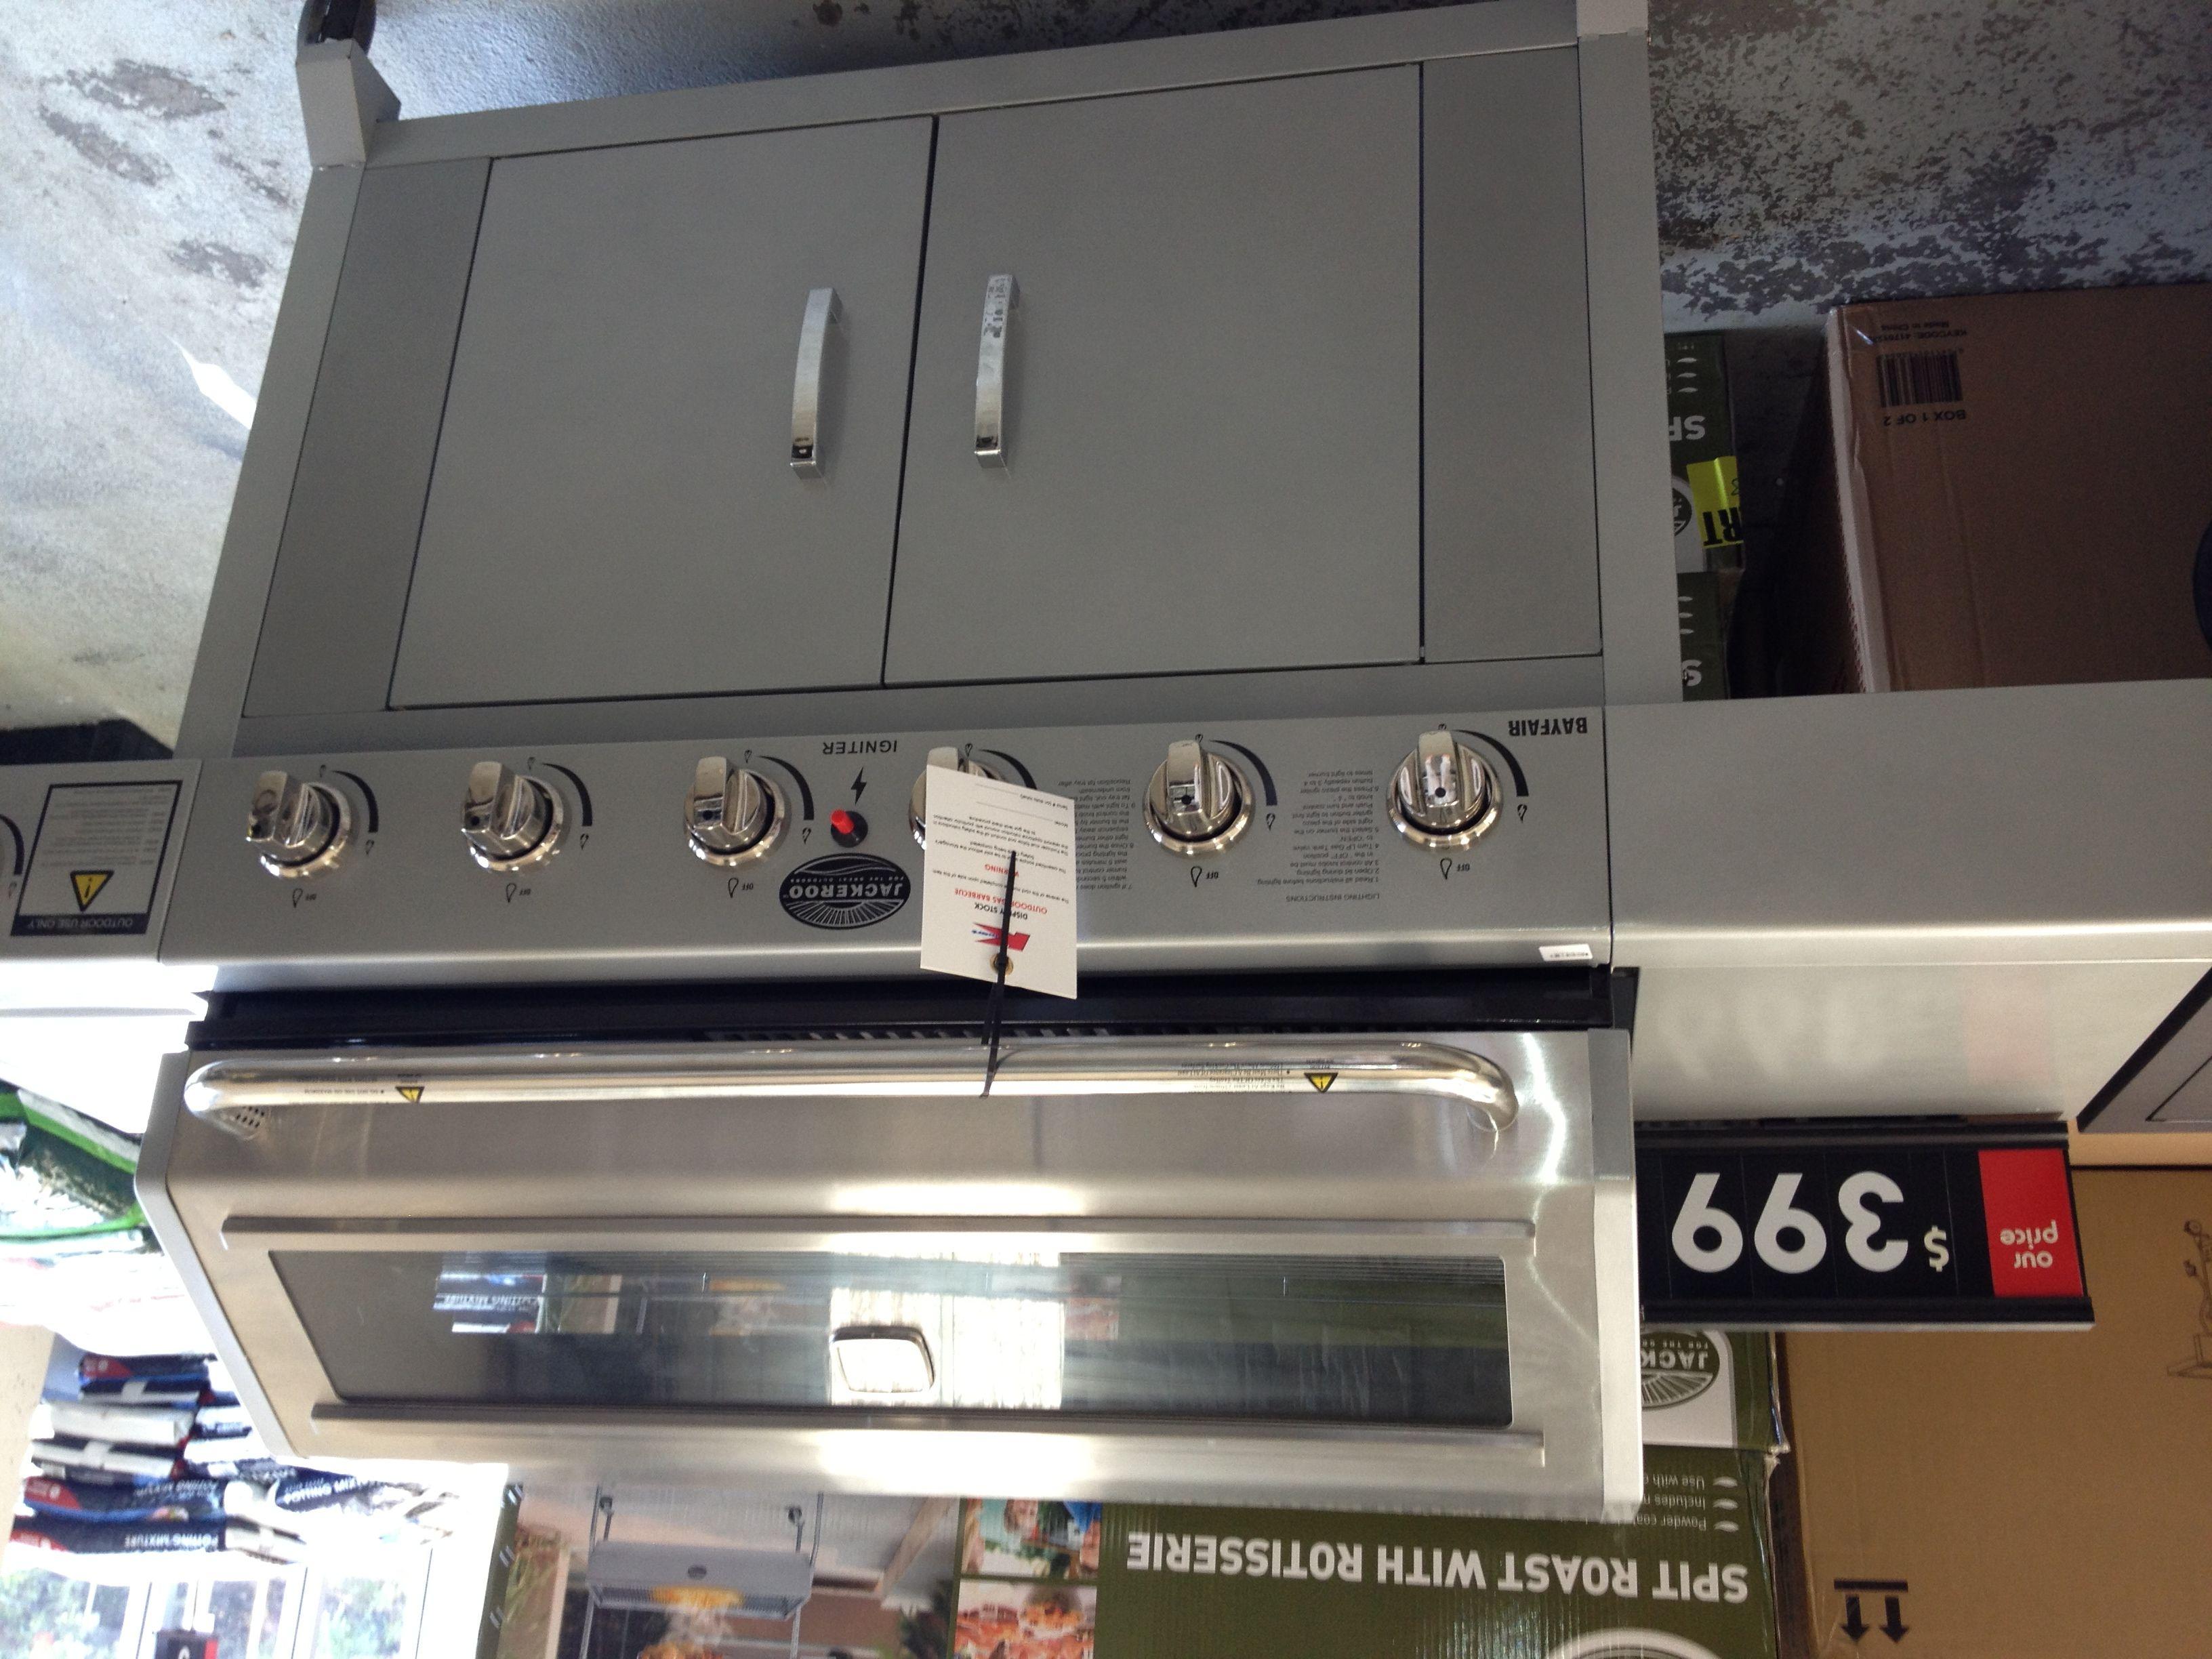 Marcia Kmart Bbq 399 00 Kitchen Cabinets Outdoor Decor Home Decor